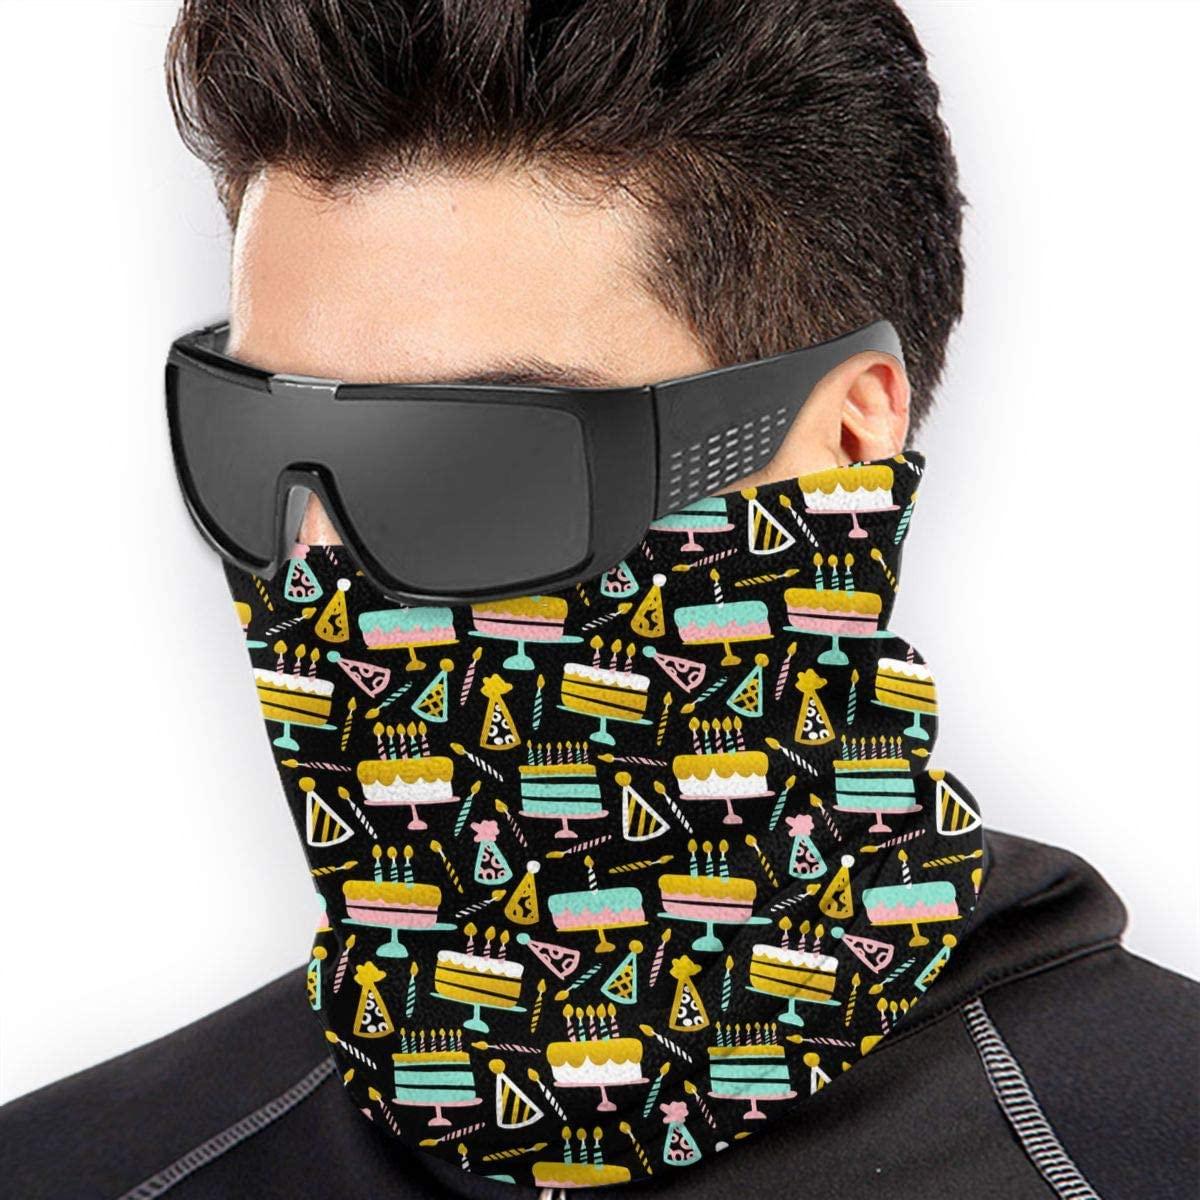 Birthday Seamless Pattern Cloth Face Mask Bandana Neck Gaiter, Sun Uv Dust Protection Reusable Tube Scarf Motorcycle Balaclava For Men Women